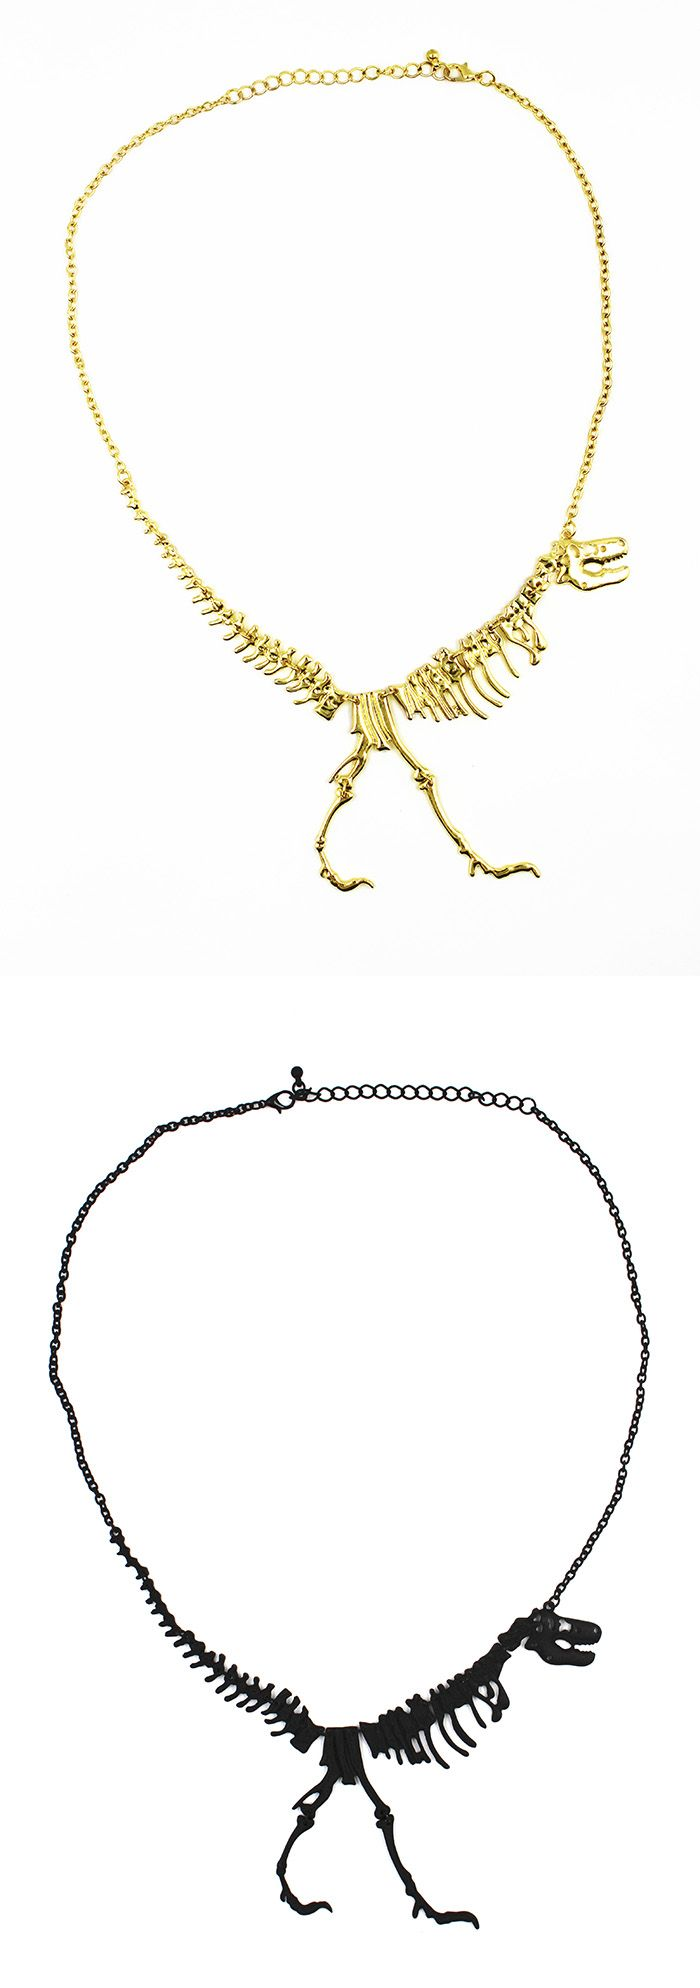 Collier squelette dinosaure http://www.shusee.com/bijoux-fantaisie/48-collier-createur-squelette-dinosaure.html